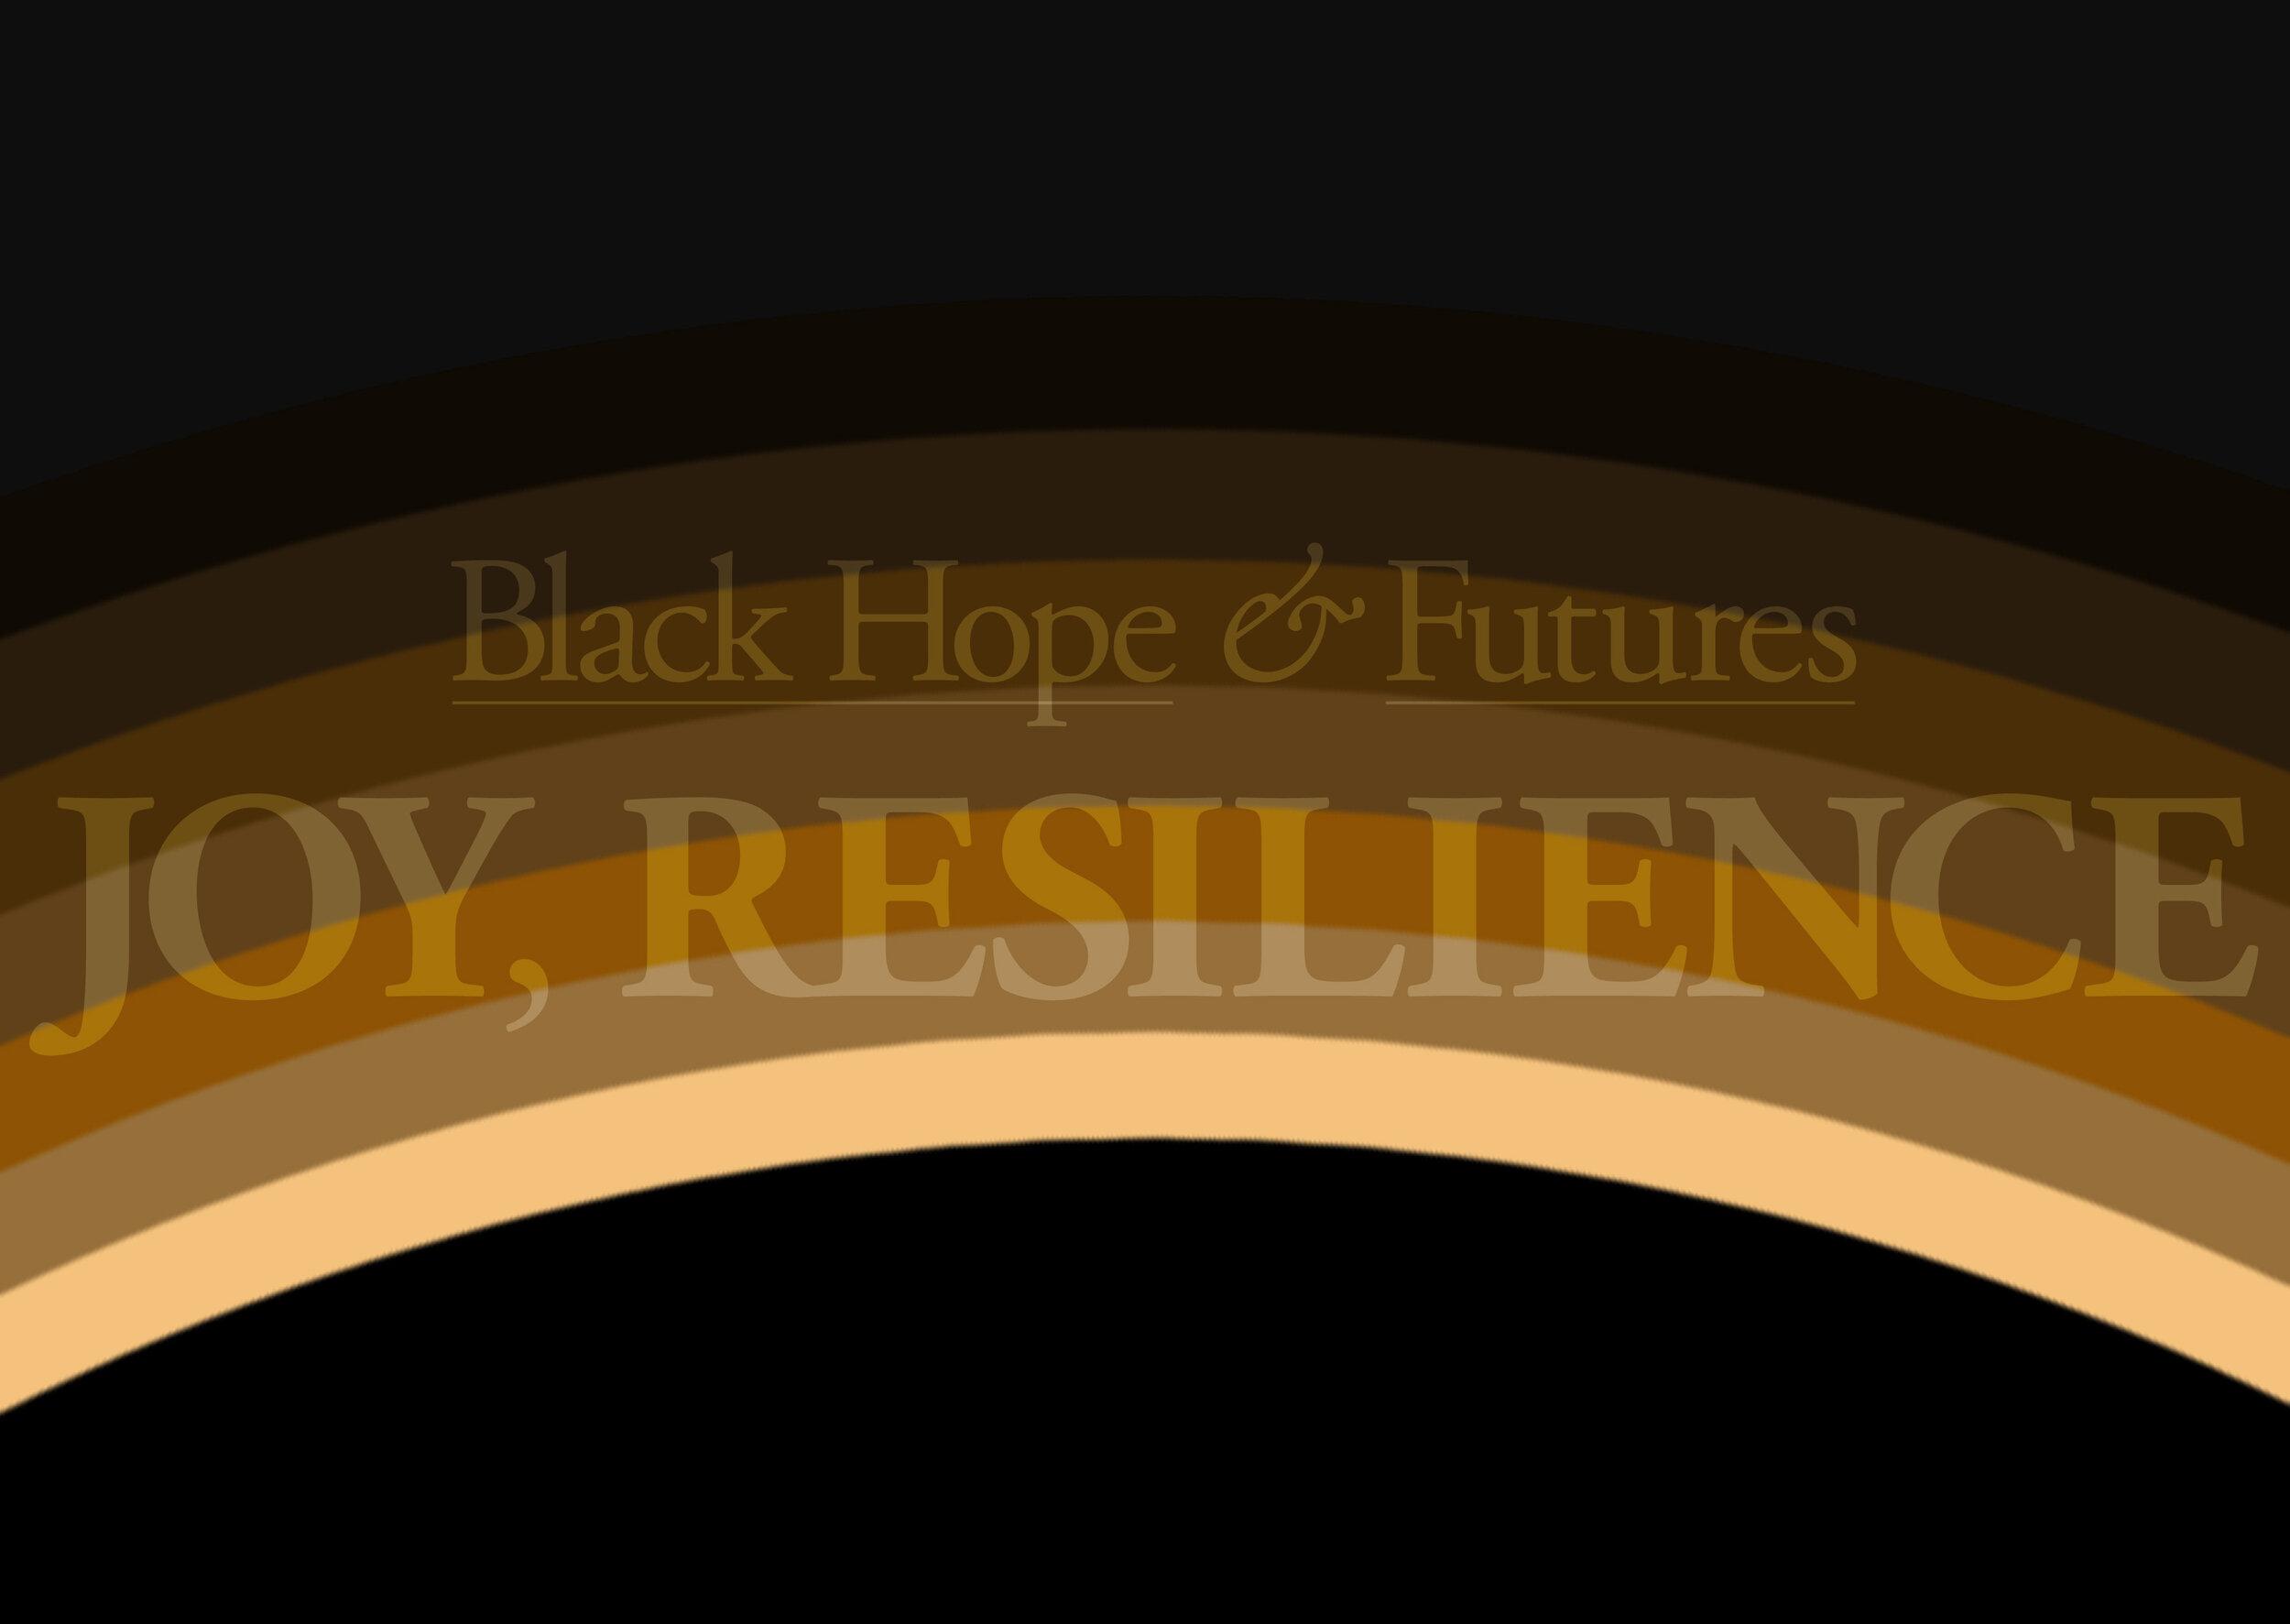 Black-Hope+Futures-final-4.jpg